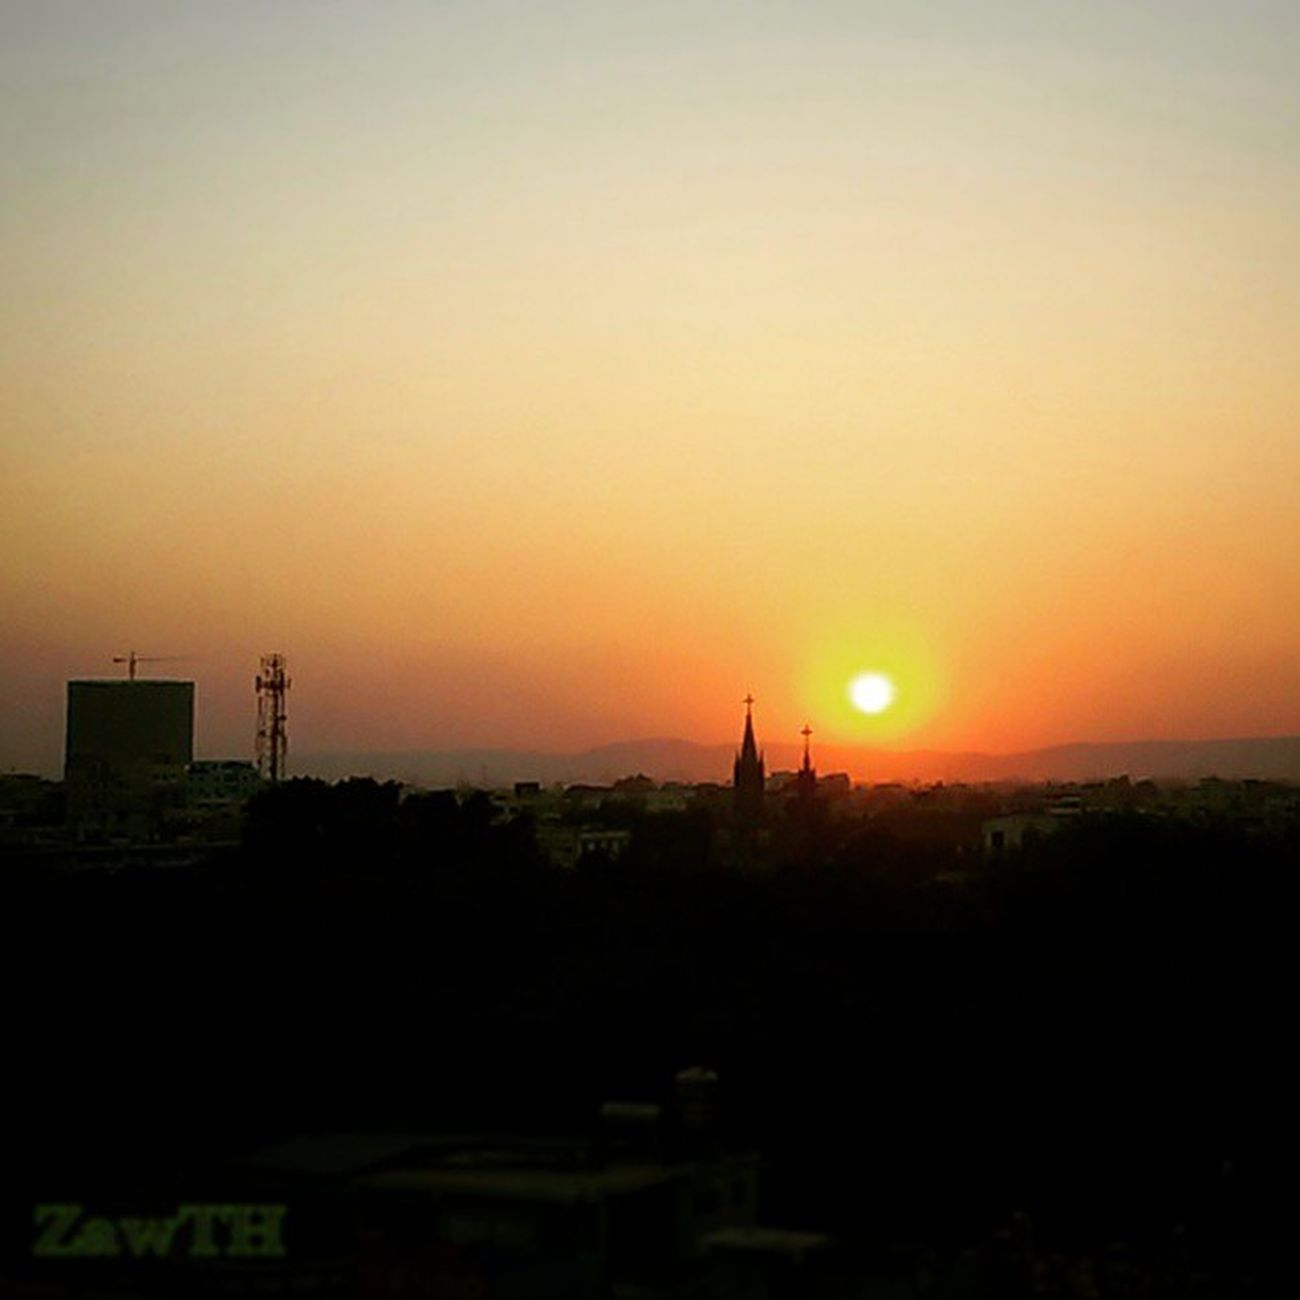 Urban Sunset. Mandalay Myanmar Myanmarphotos Goldenlandscape Goldenland Vscomyanmar Conpixel Cameraemfoco Collection_splash Bns_sky Bsnfamily Best_skyshots Best_Silhouette Amazingphotohunter Arte_of_nature Instalife_shot Igersmandalay Igs_asia Igersmyanmar Irrawaddy Ig_photo_life Bsn_sunset Sunset Summer Sky_captures skys_of_theworld skystalking stunning_shots galaxygrand2 zawth